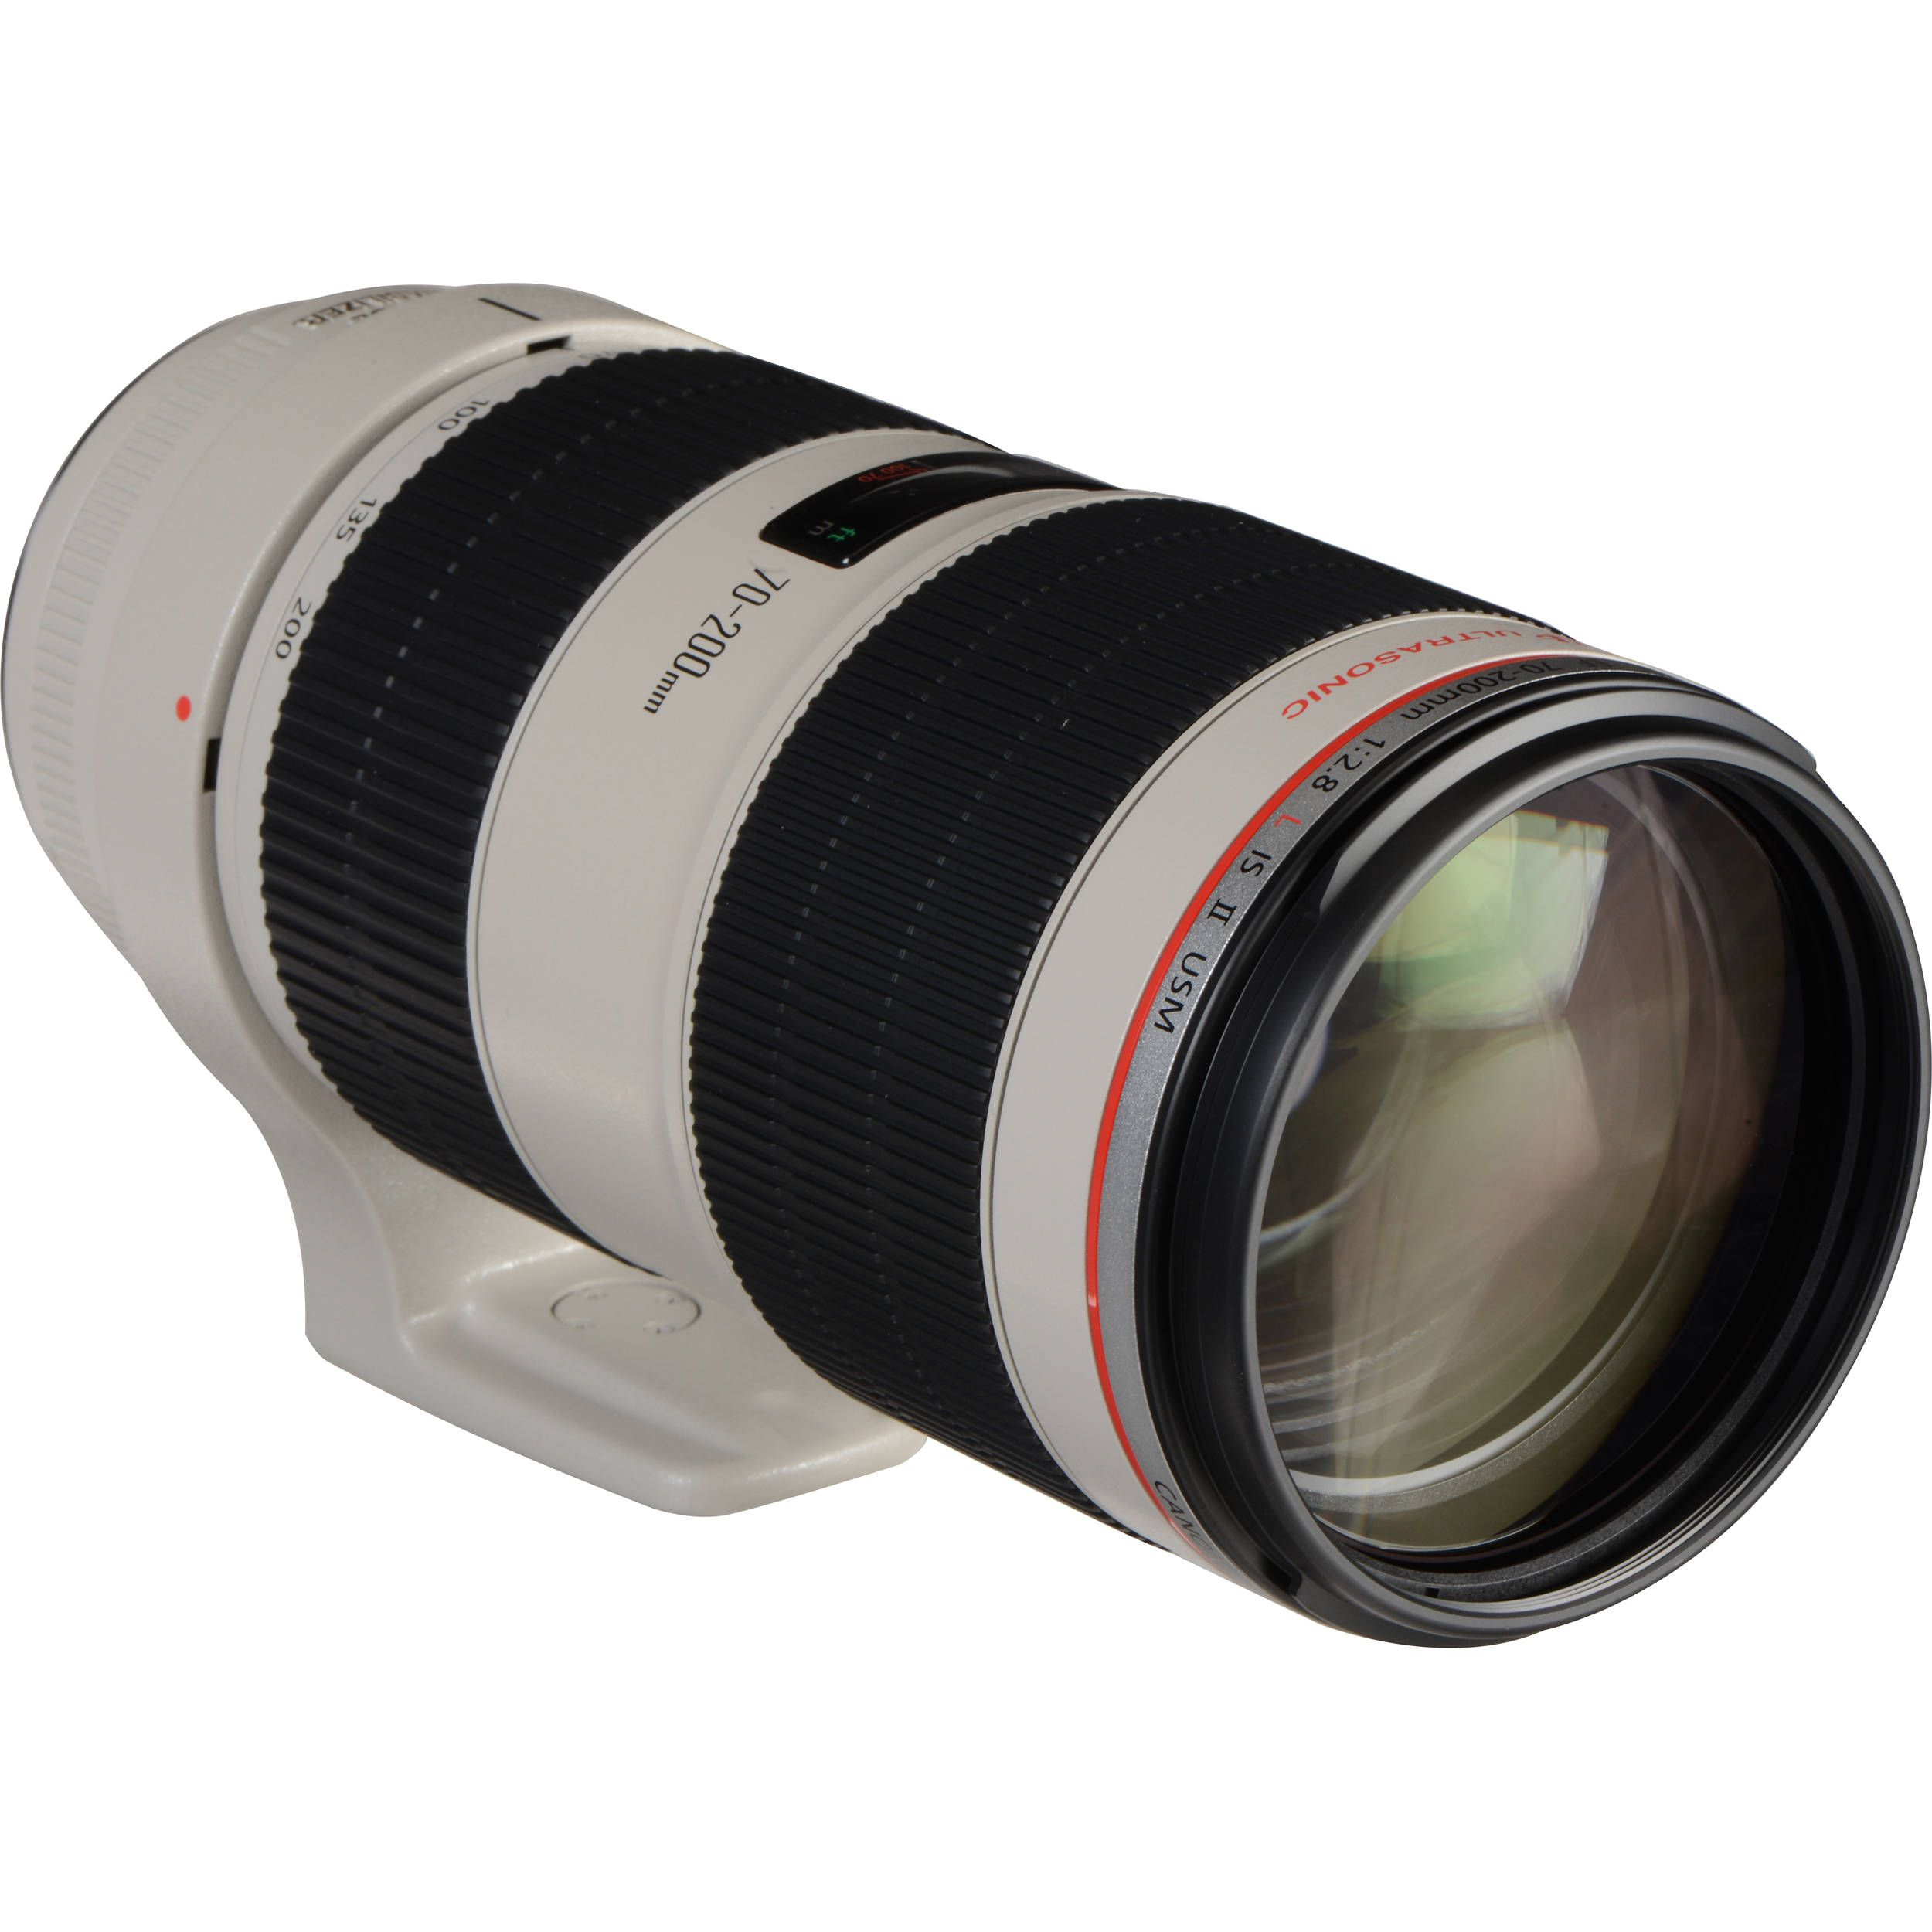 Canon EF 70-200mm f/2.8L IS II USM Lens | Best lenses for canon ...